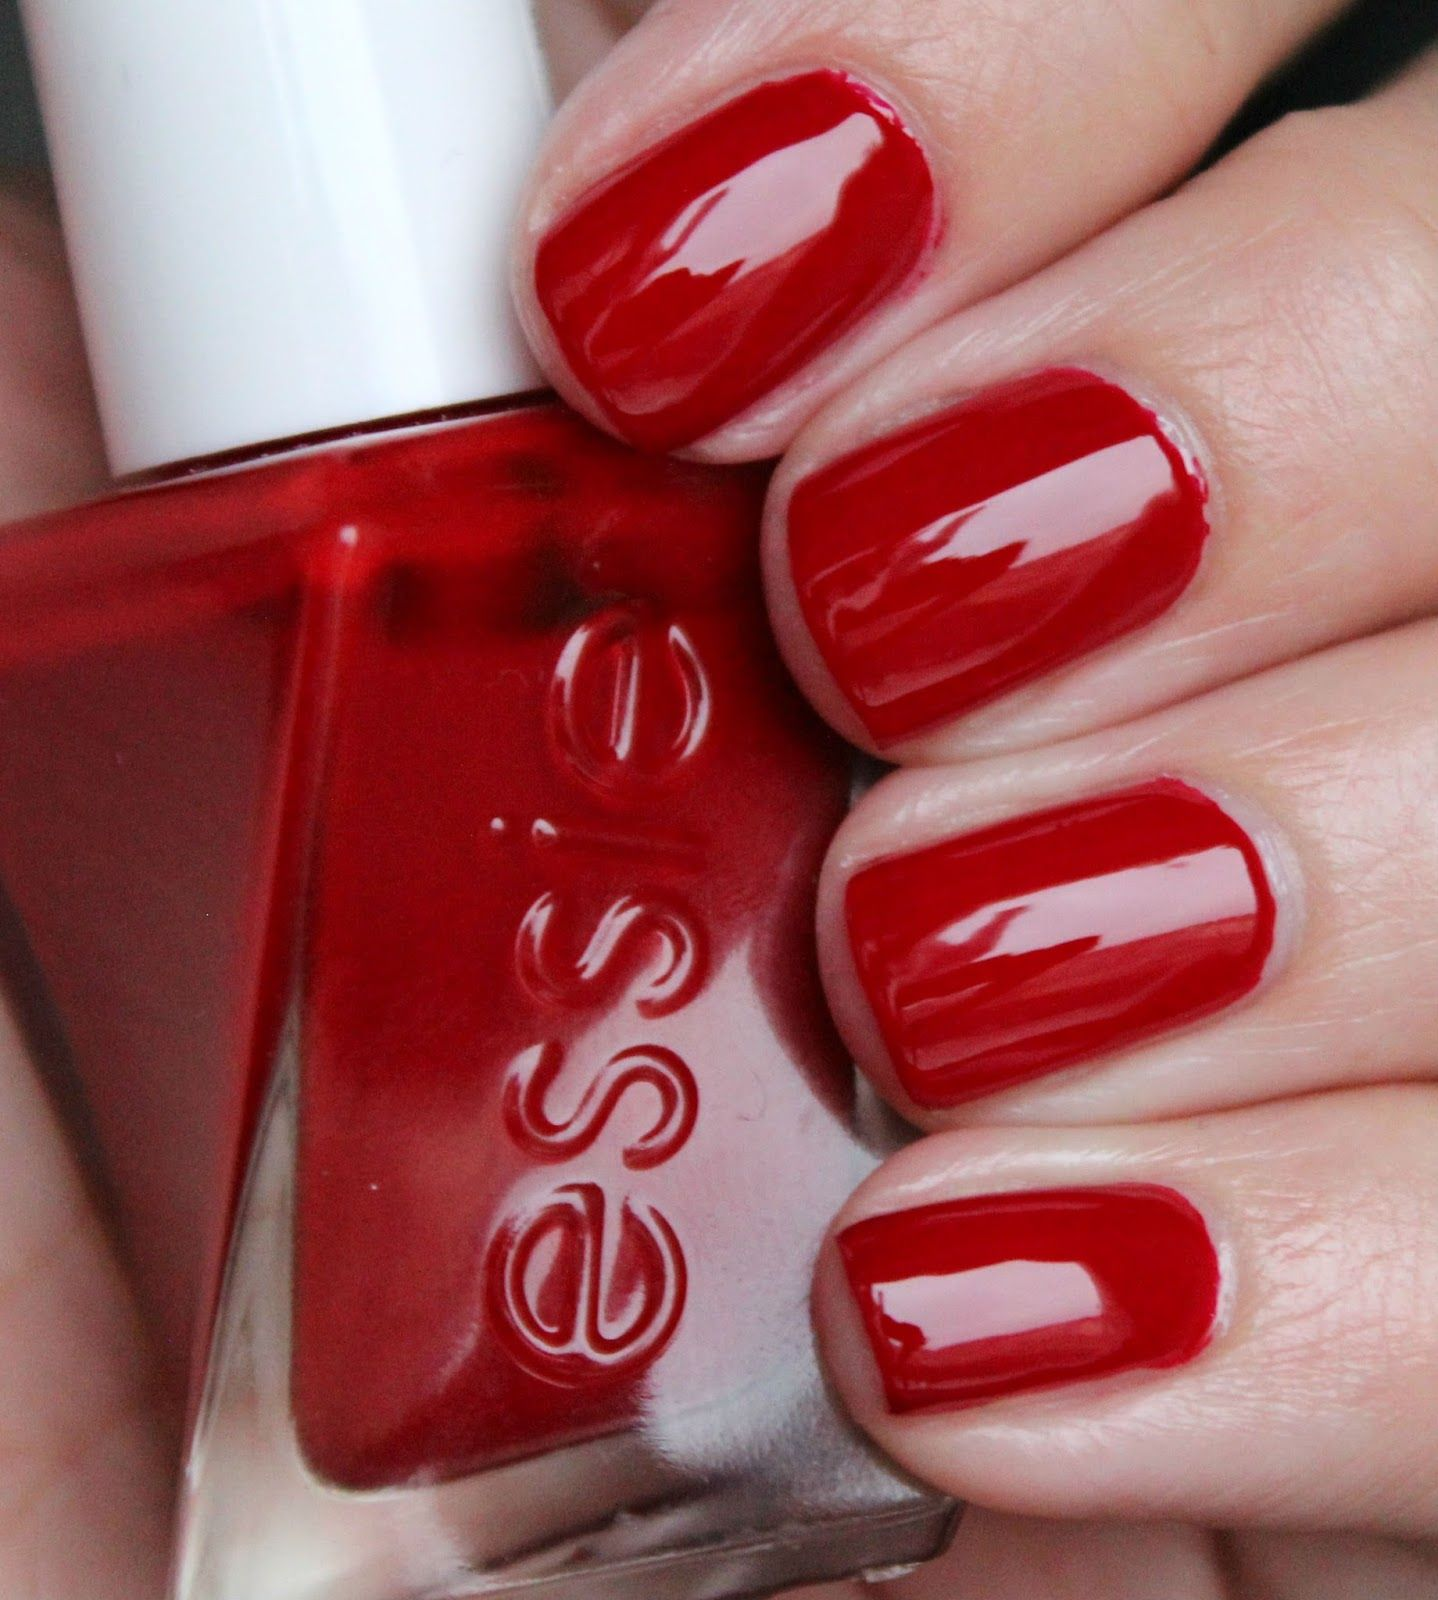 Essie Gel Couture - Bubbles Only | Nail polish | Pinterest | Esmalte